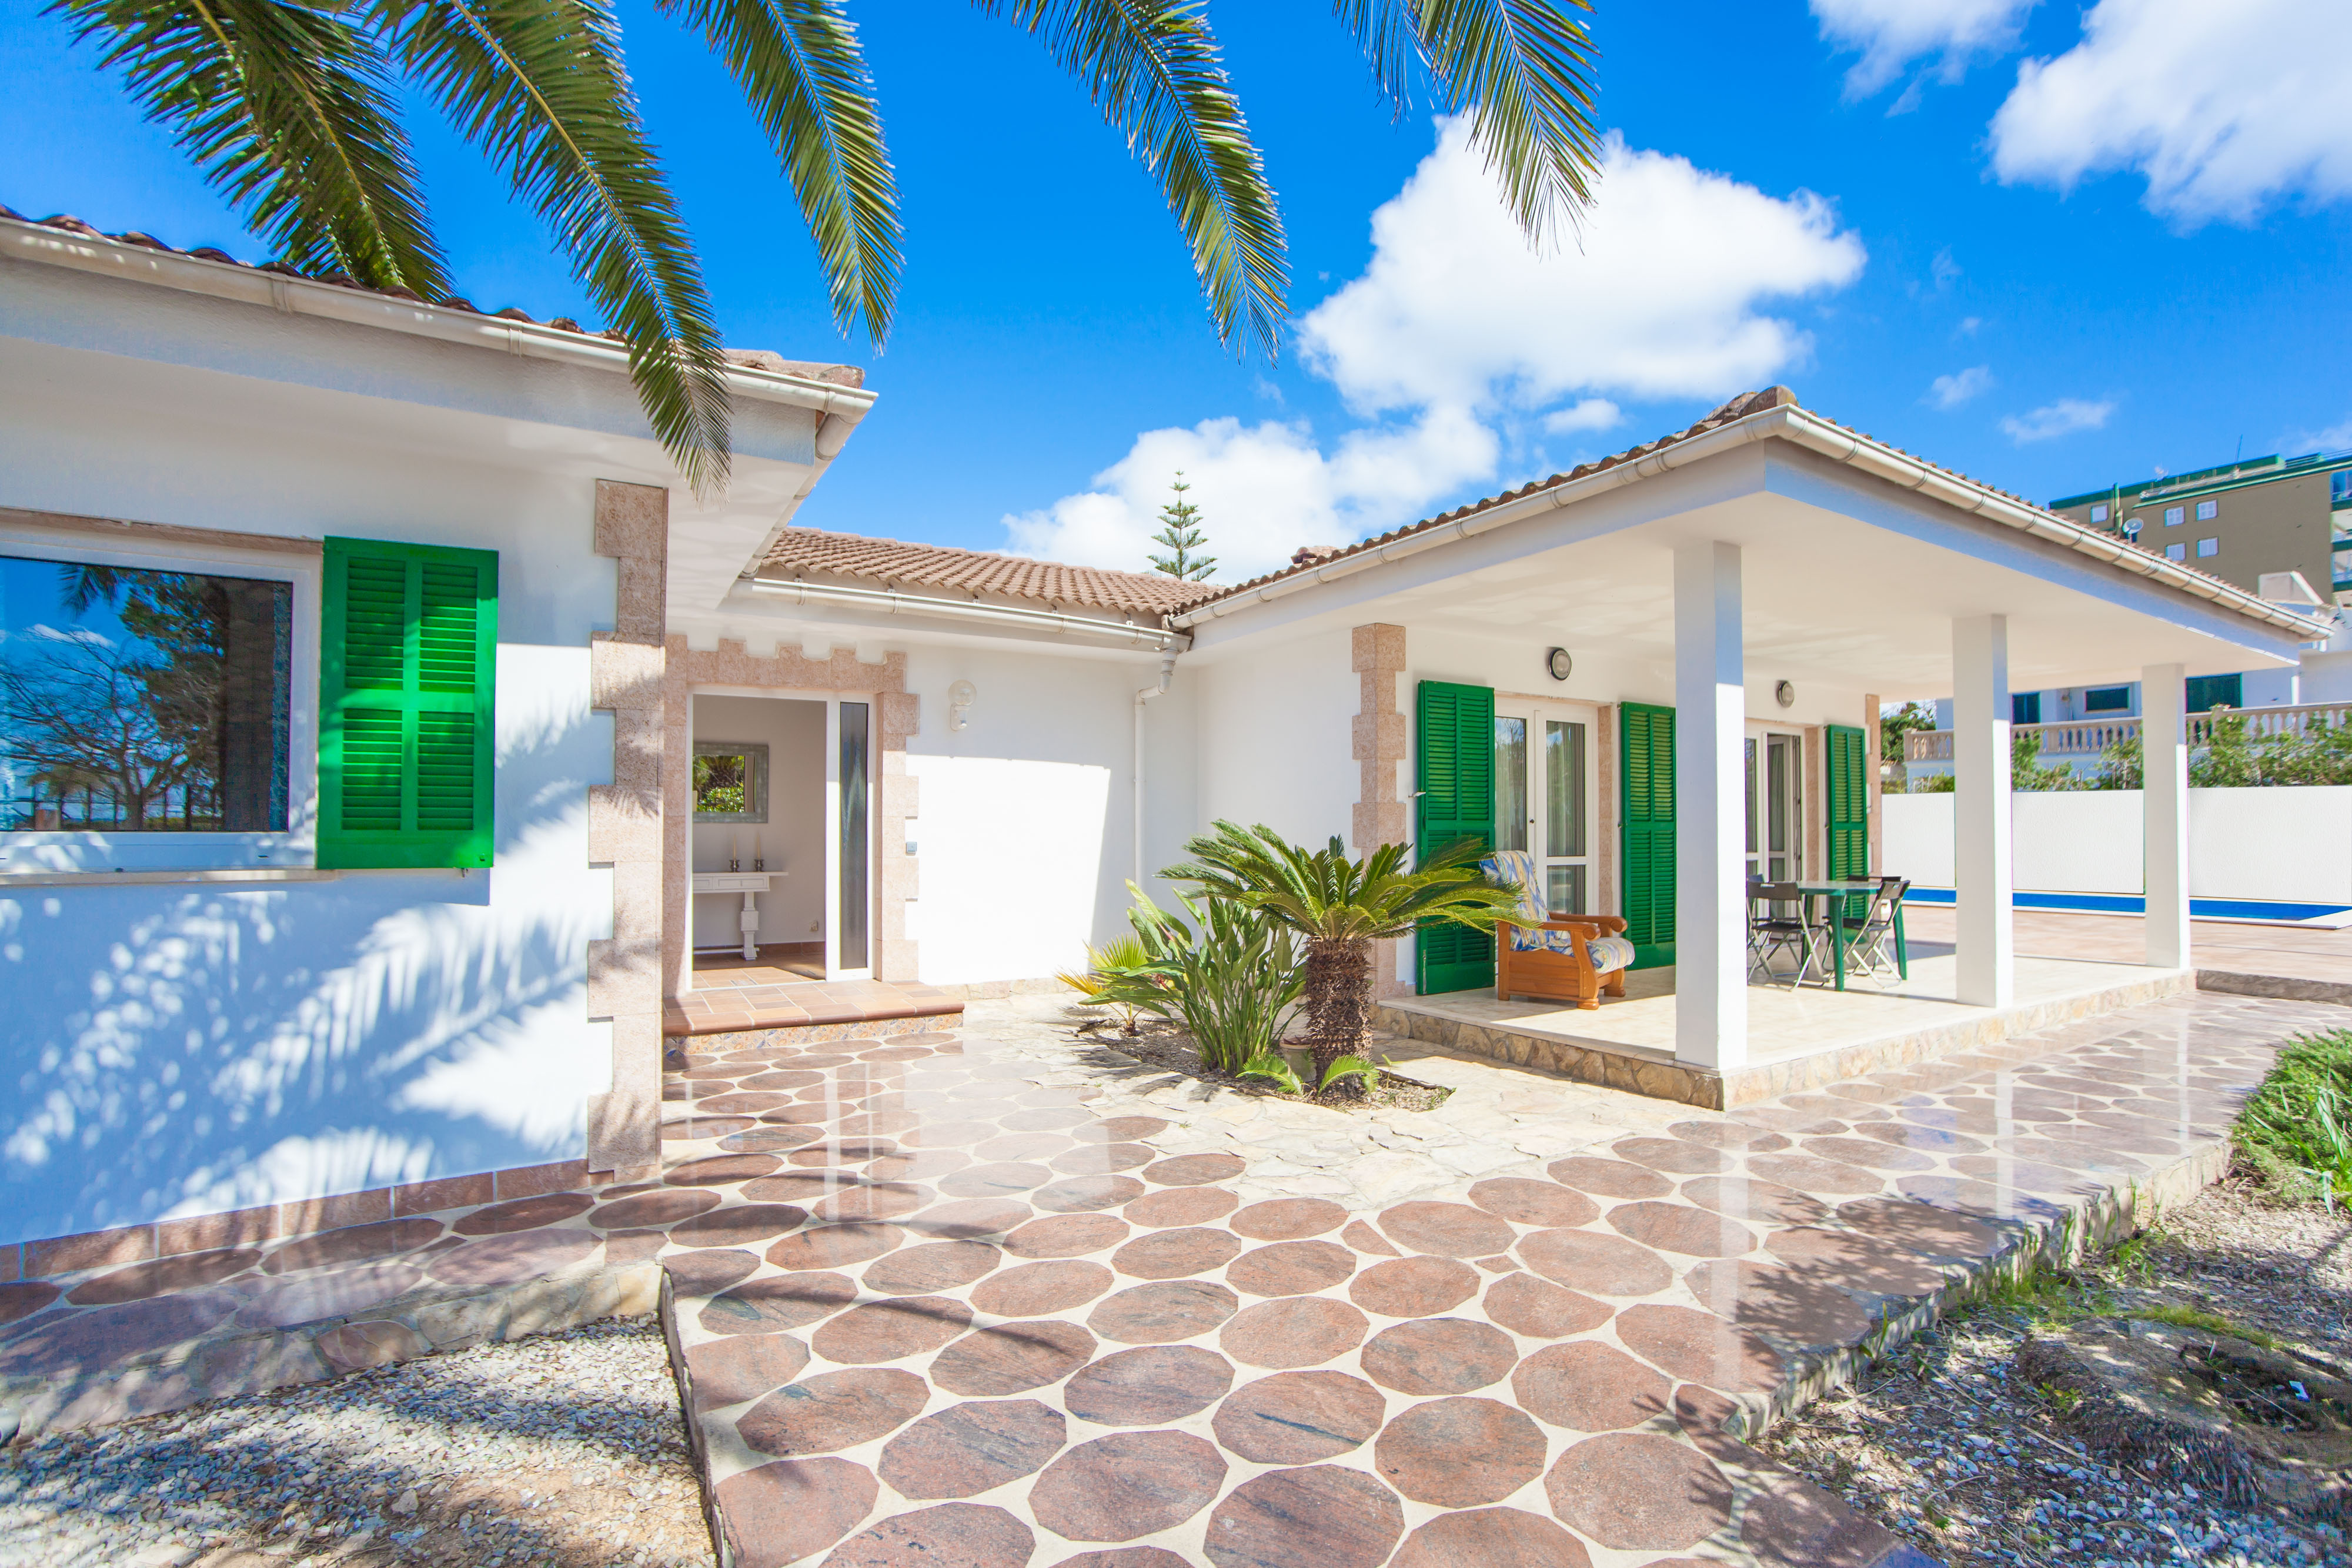 Ferienhaus RODRIGUEZ DE LA FUENTE 19 (SIN NOMBRE) (2144936), Platja de Muro, Mallorca, Balearische Inseln, Spanien, Bild 30